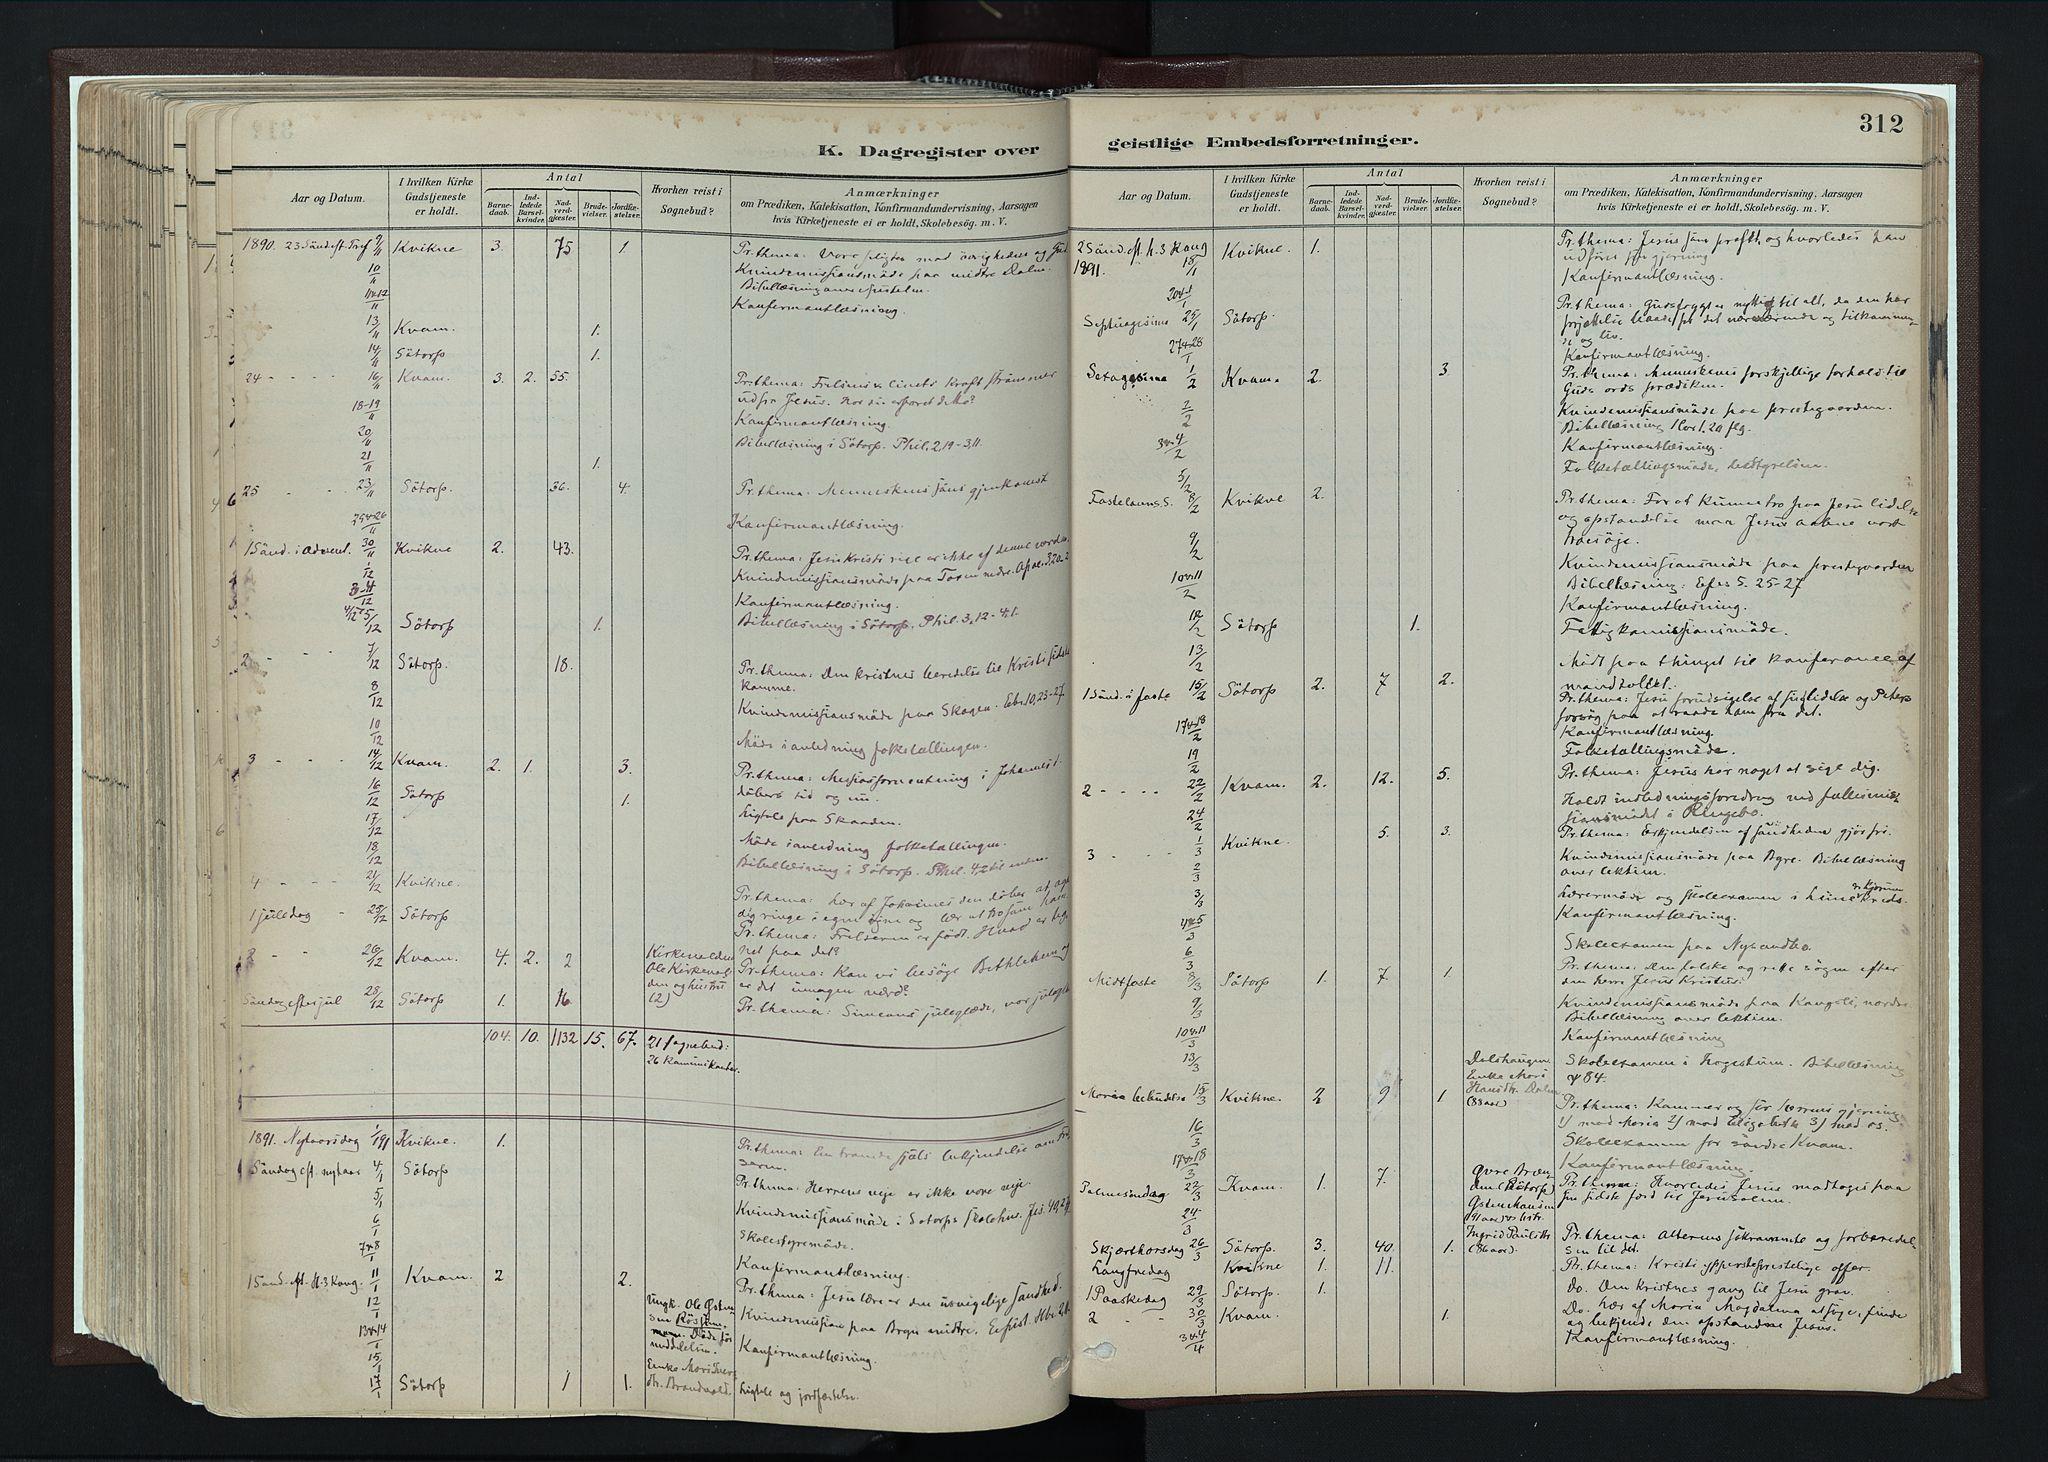 SAH, Nord-Fron prestekontor, Ministerialbok nr. 4, 1884-1914, s. 312